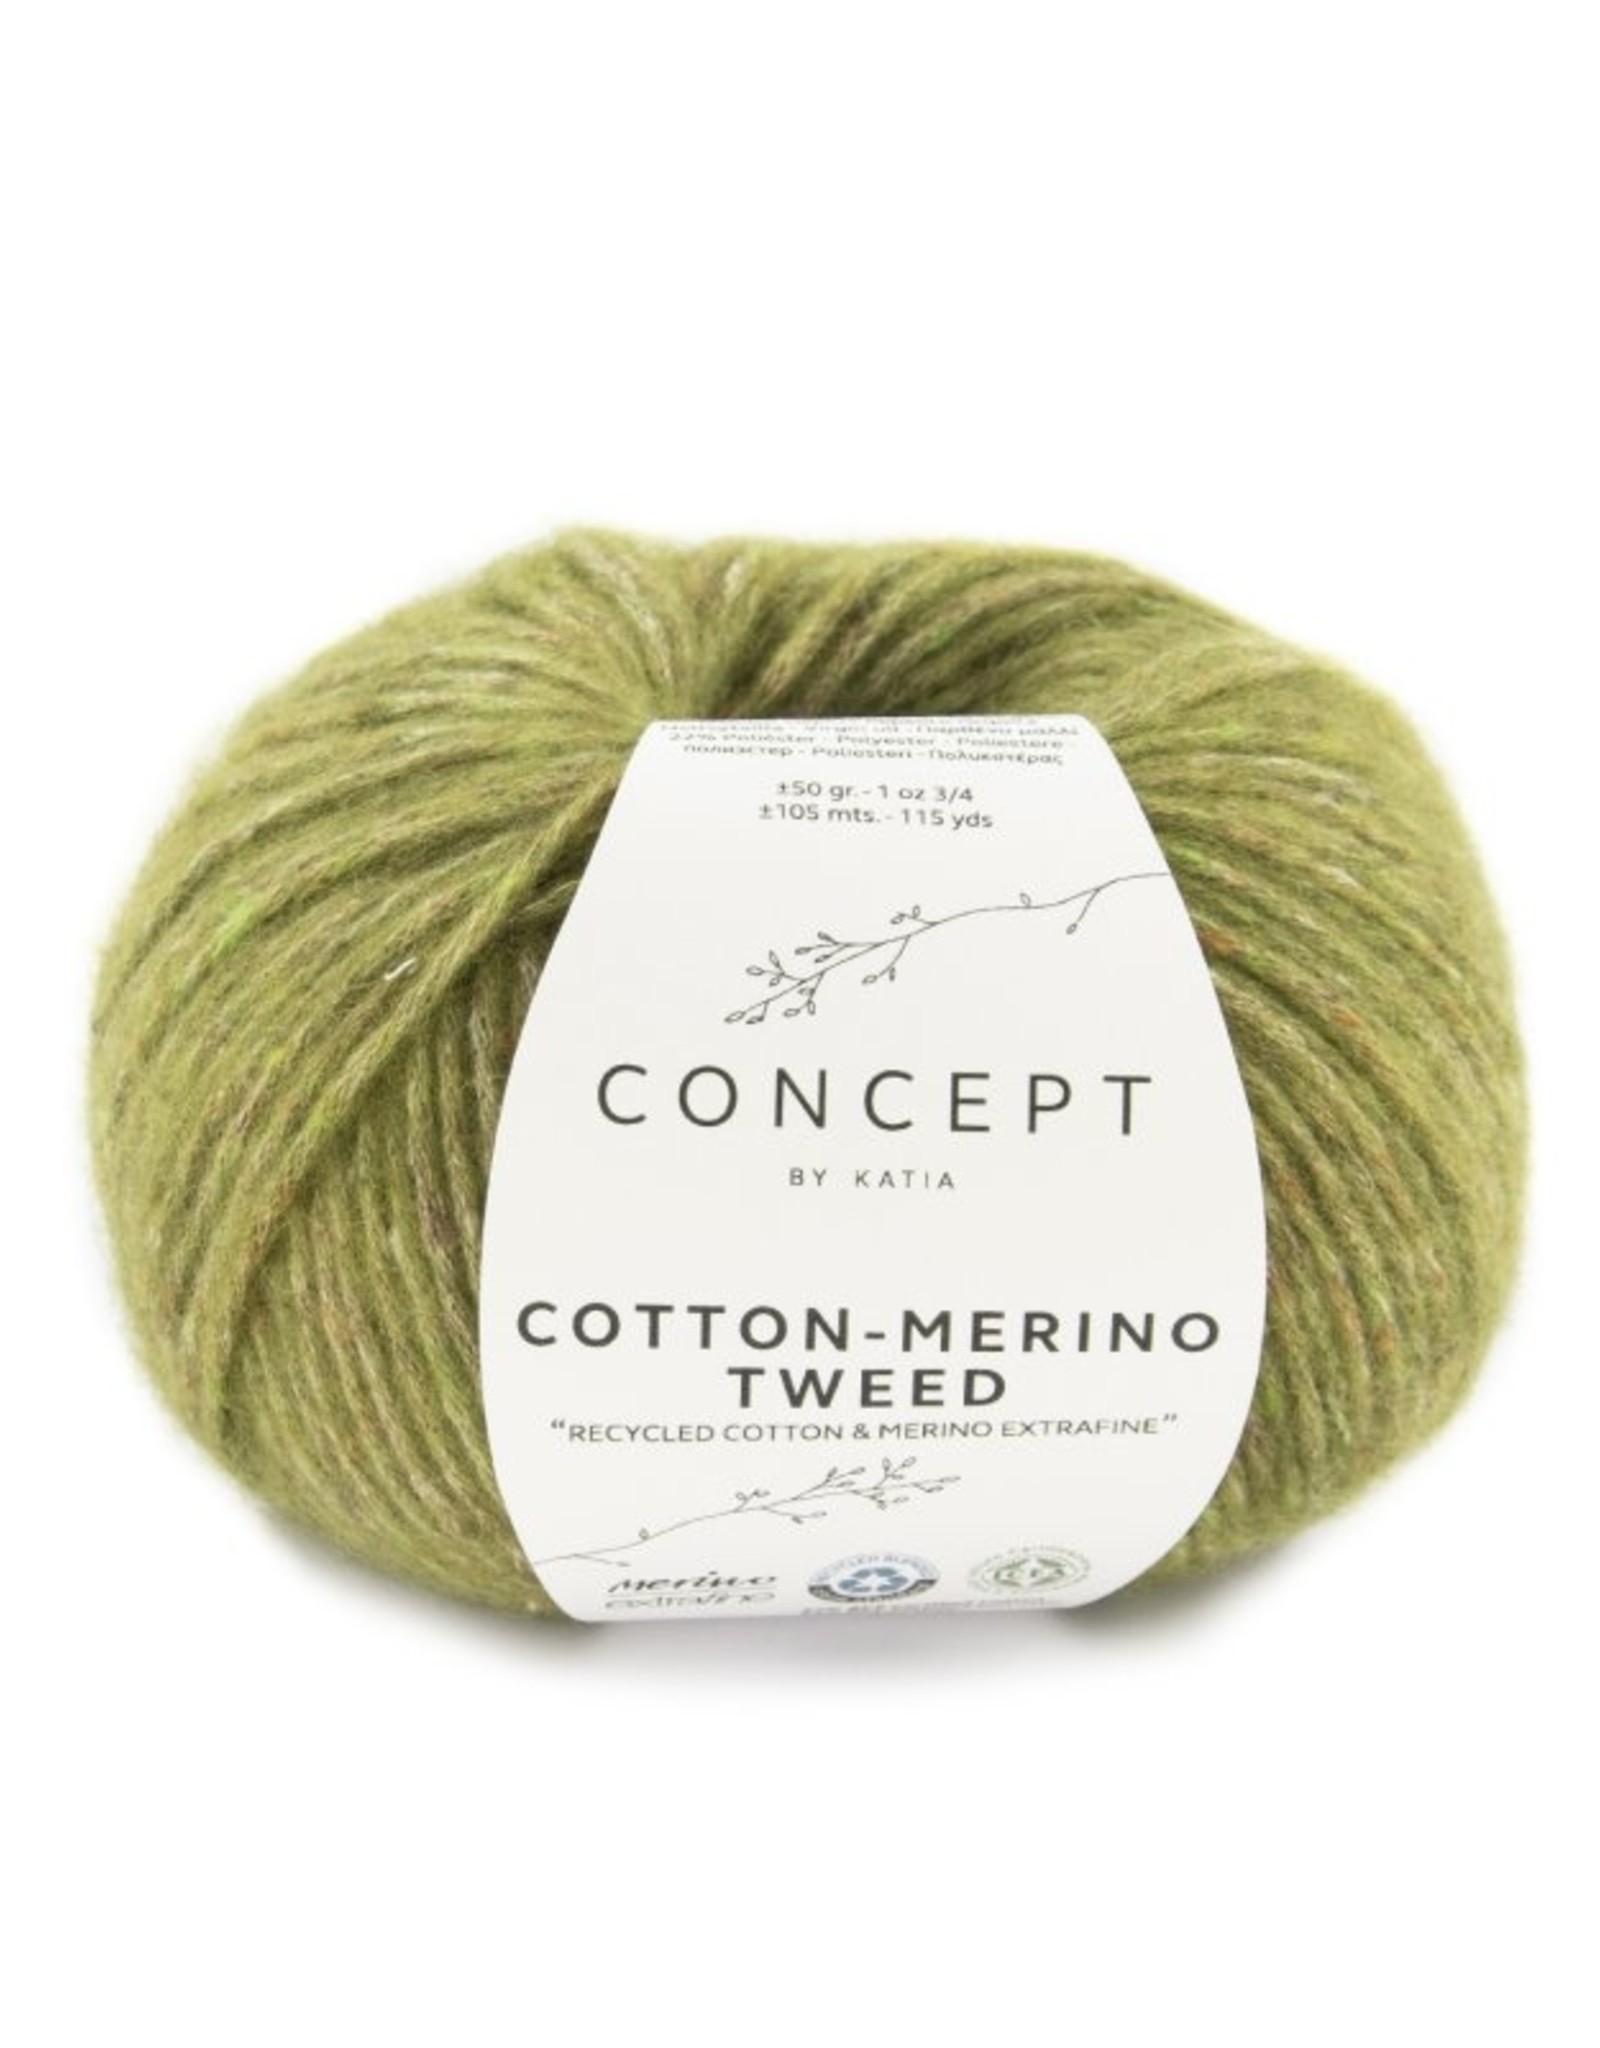 Katia Cotton -Merino Tweed